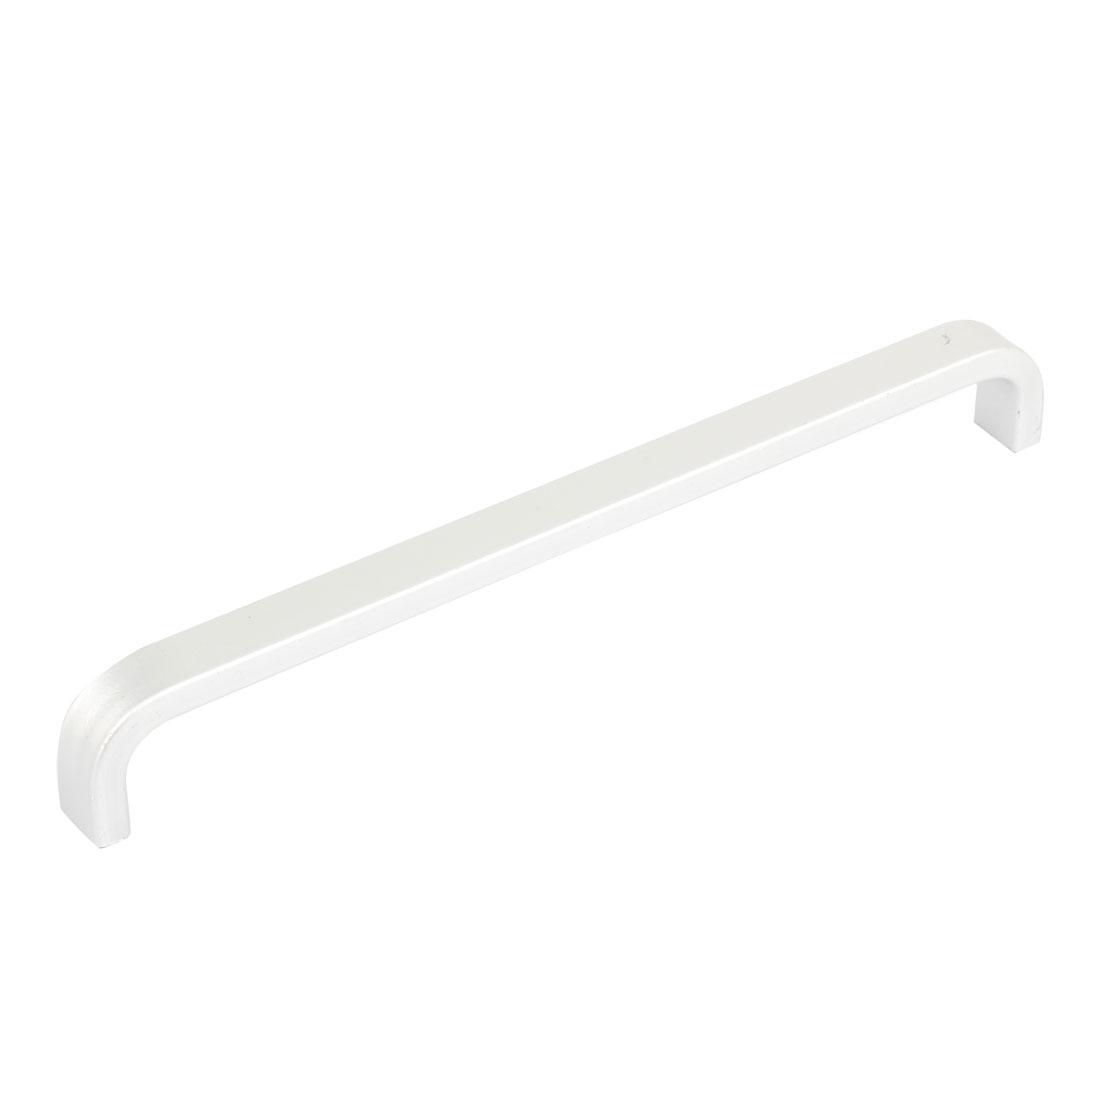 Hardware Sideboard Cupboard Screw Mounting Aluminum Pull Handle 16.5cm Long